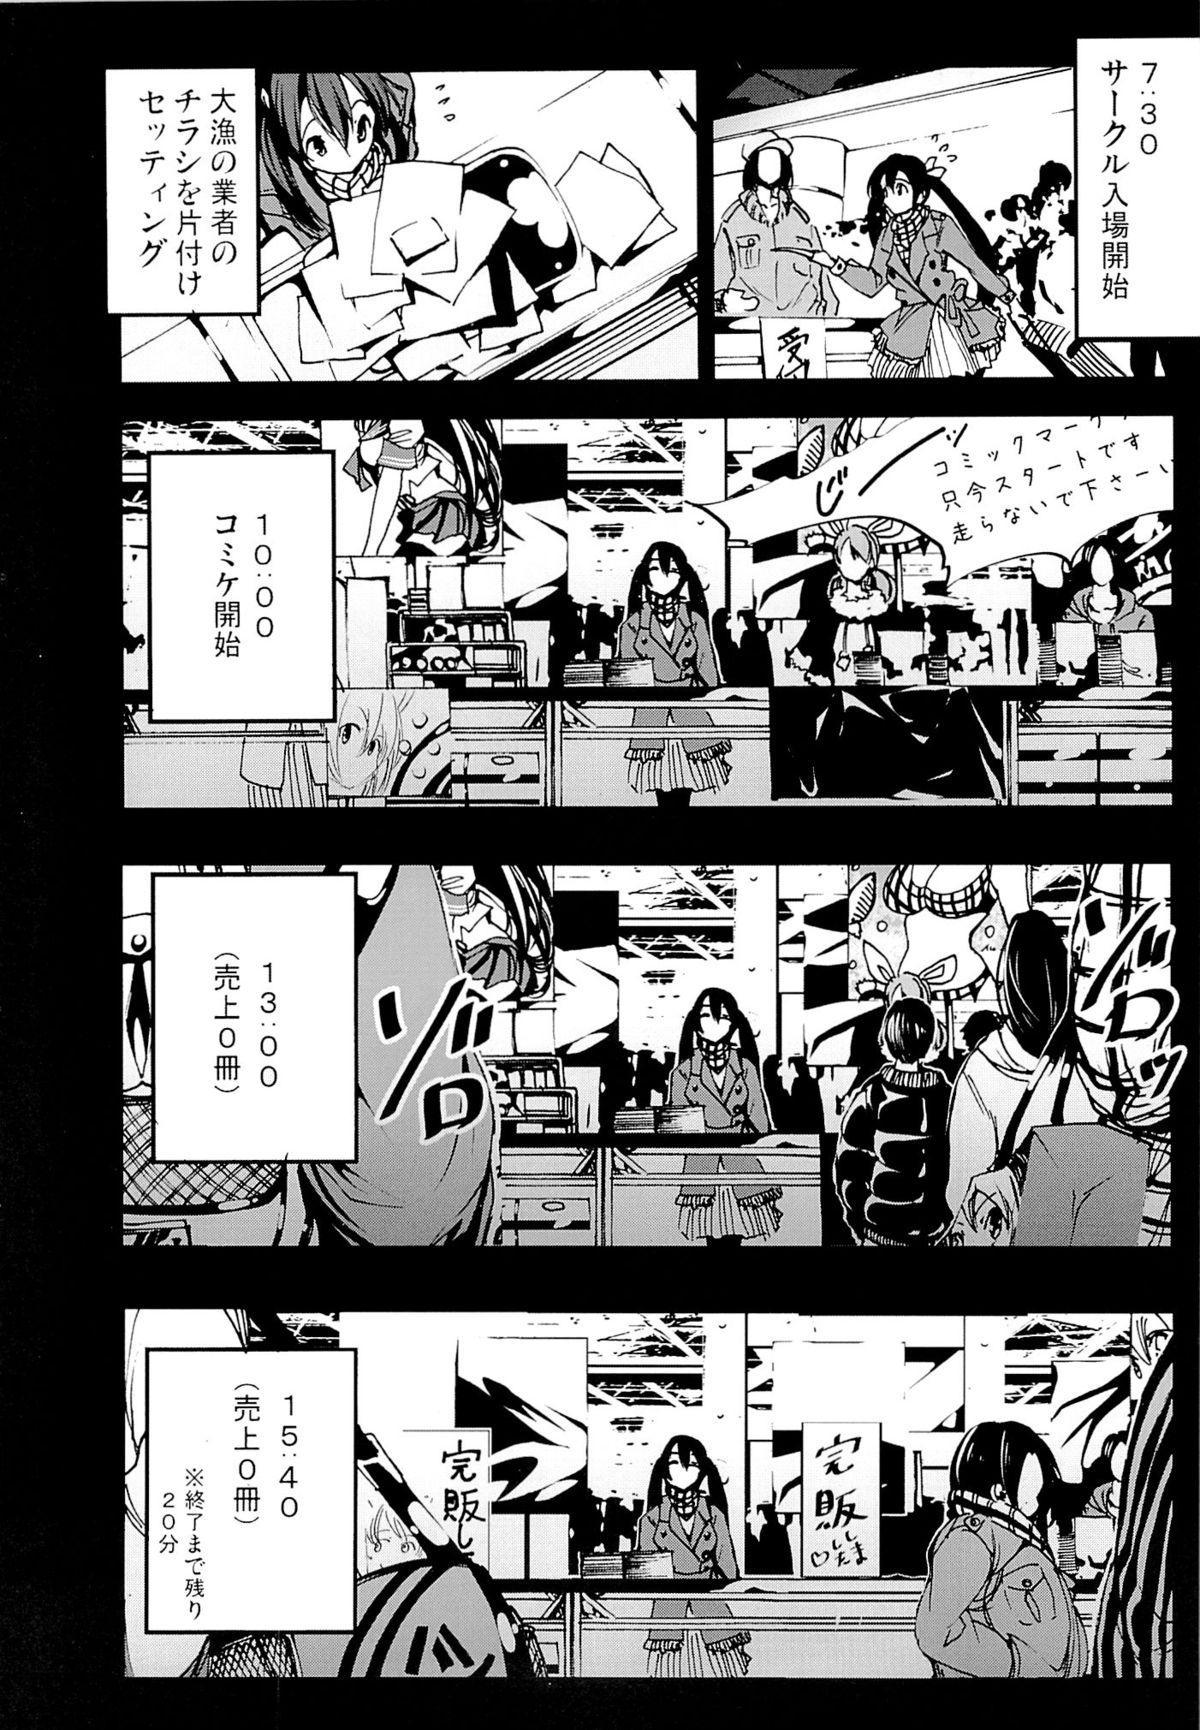 H na Doujinshi no Kakikata 4